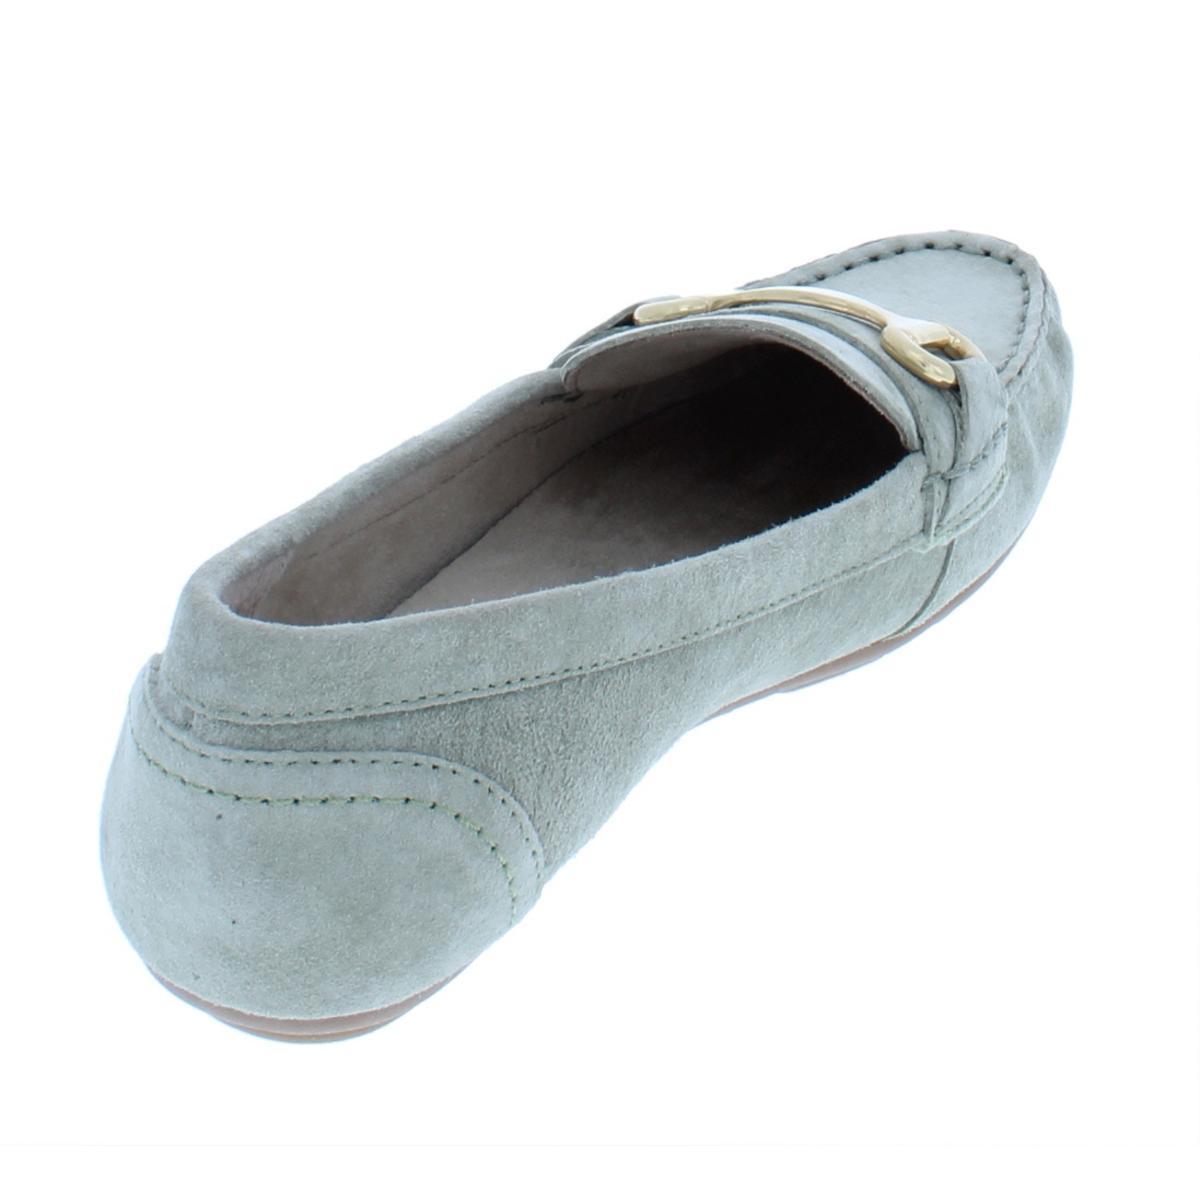 White-Mountain-Womens-Scotch-Padded-Insole-Dress-Moccasins-Shoes-BHFO-3287 thumbnail 6